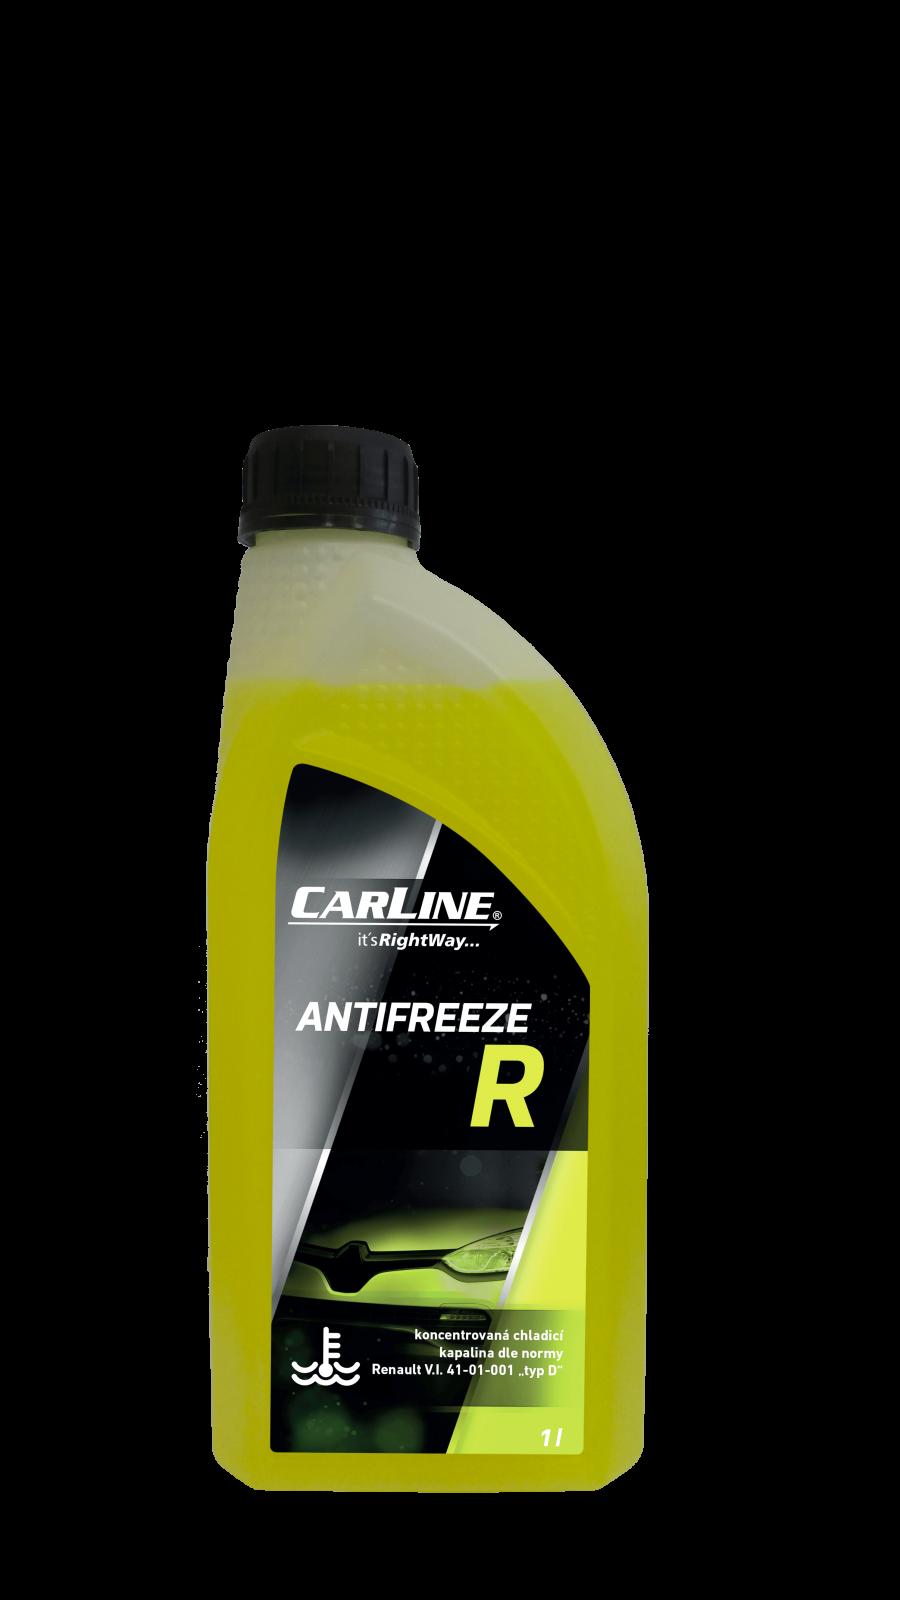 Carline Antifreeze R (MaXI D) 25 L